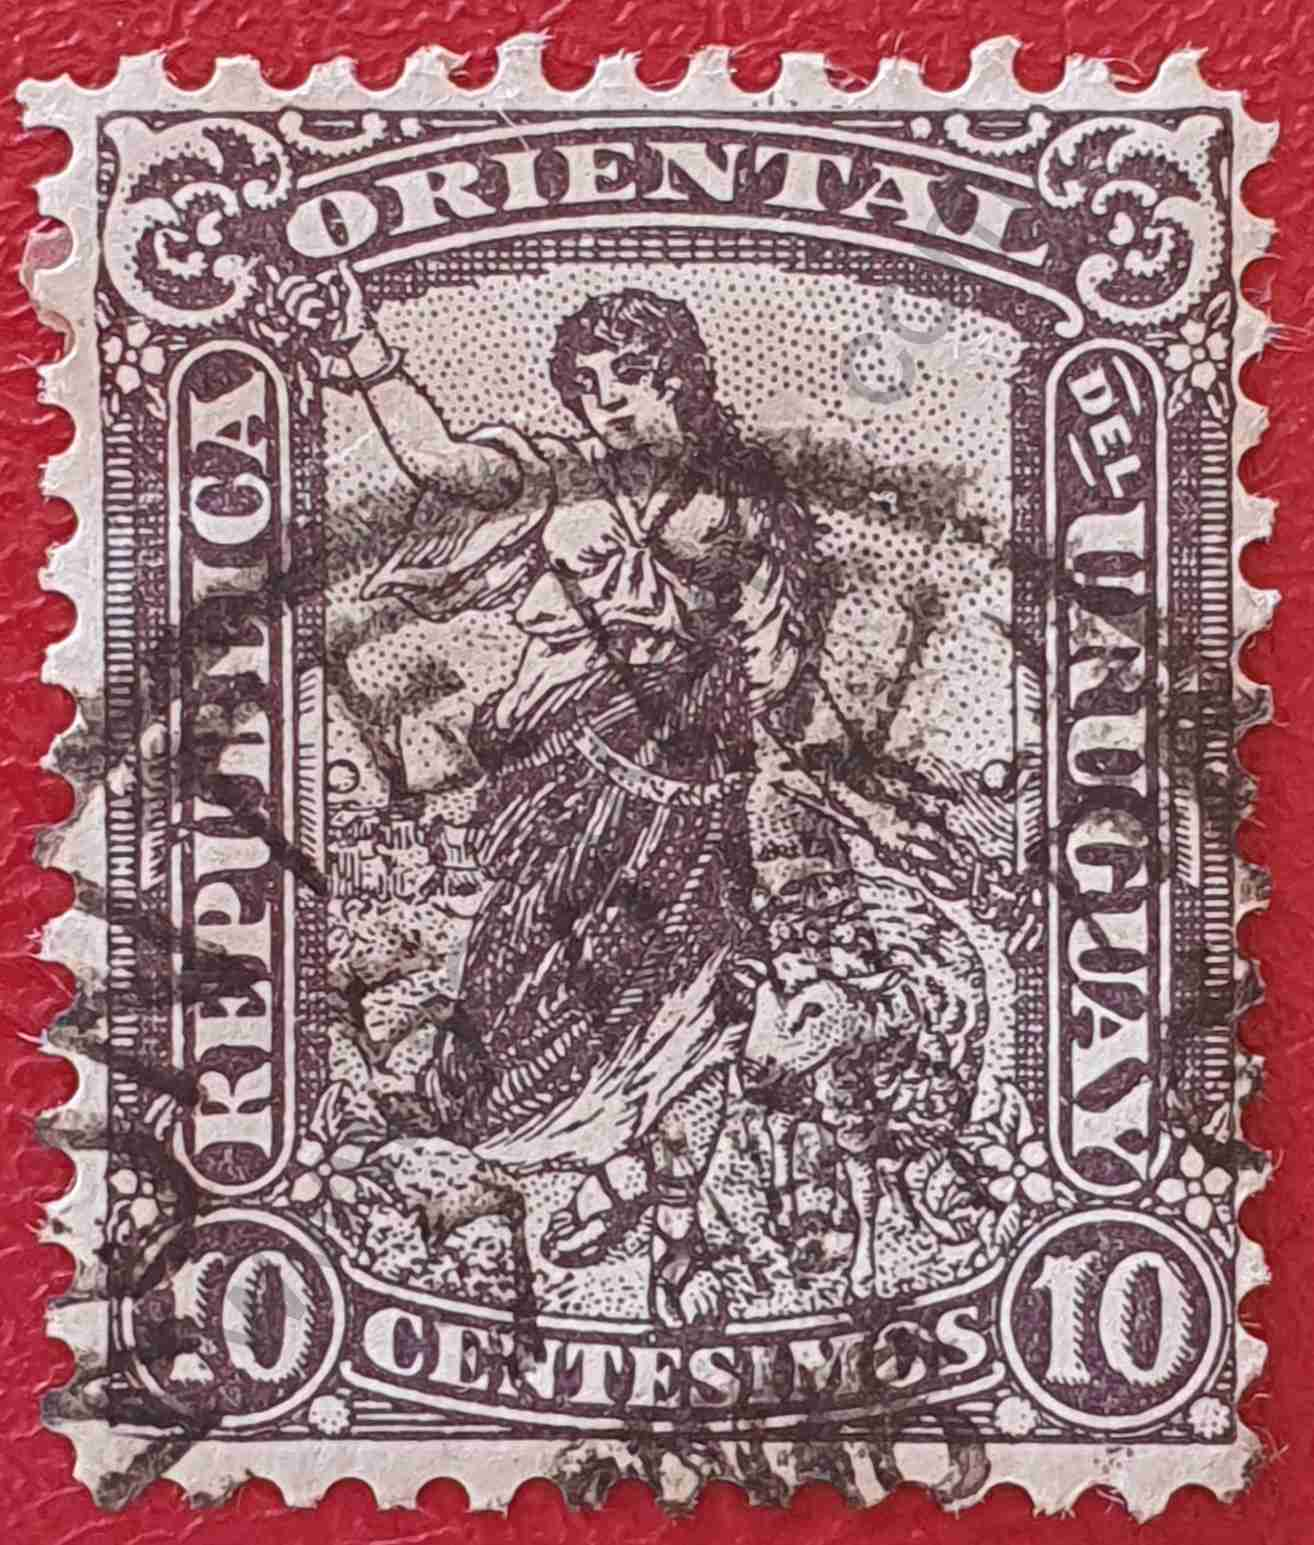 Pastora y oveja - Sello de Uruguay 1905